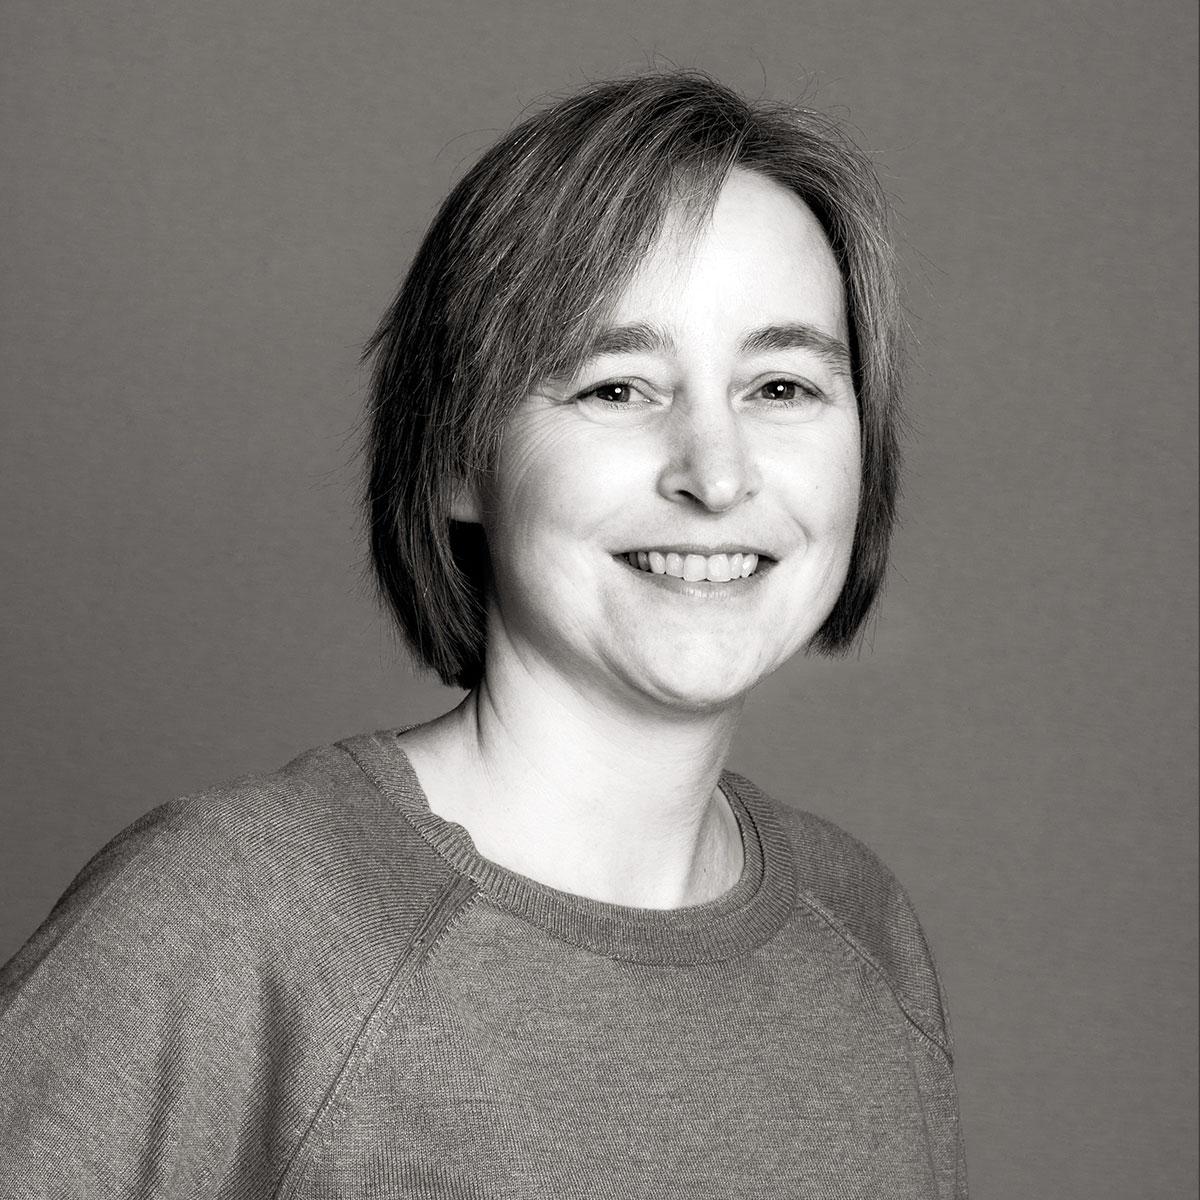 Nancy K. Nyrud